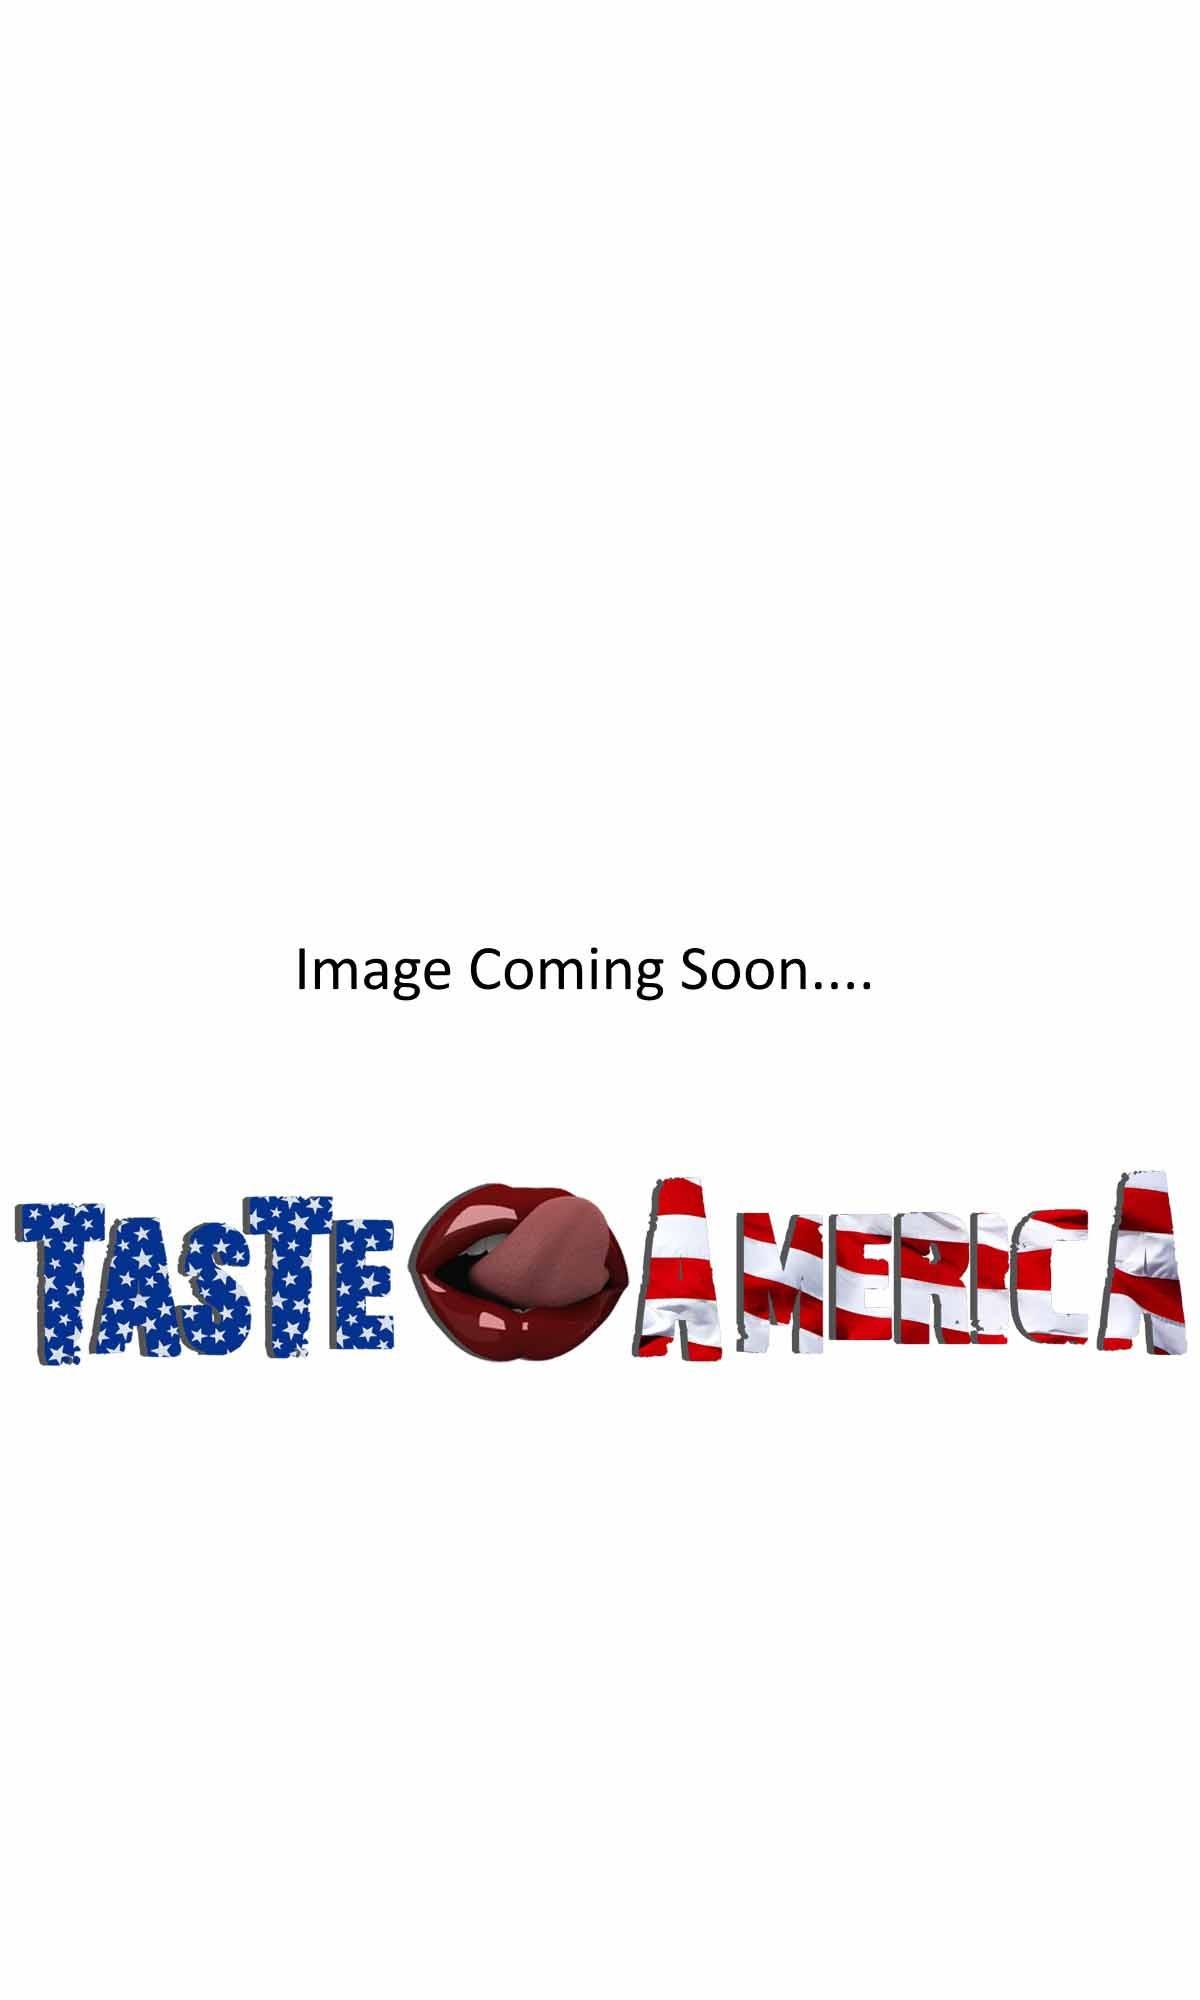 Buy Arizona Arnold Palmer Half & Half Iced Tea Lemonade Drink Mix 10 Stix Pack At TasteAmerica